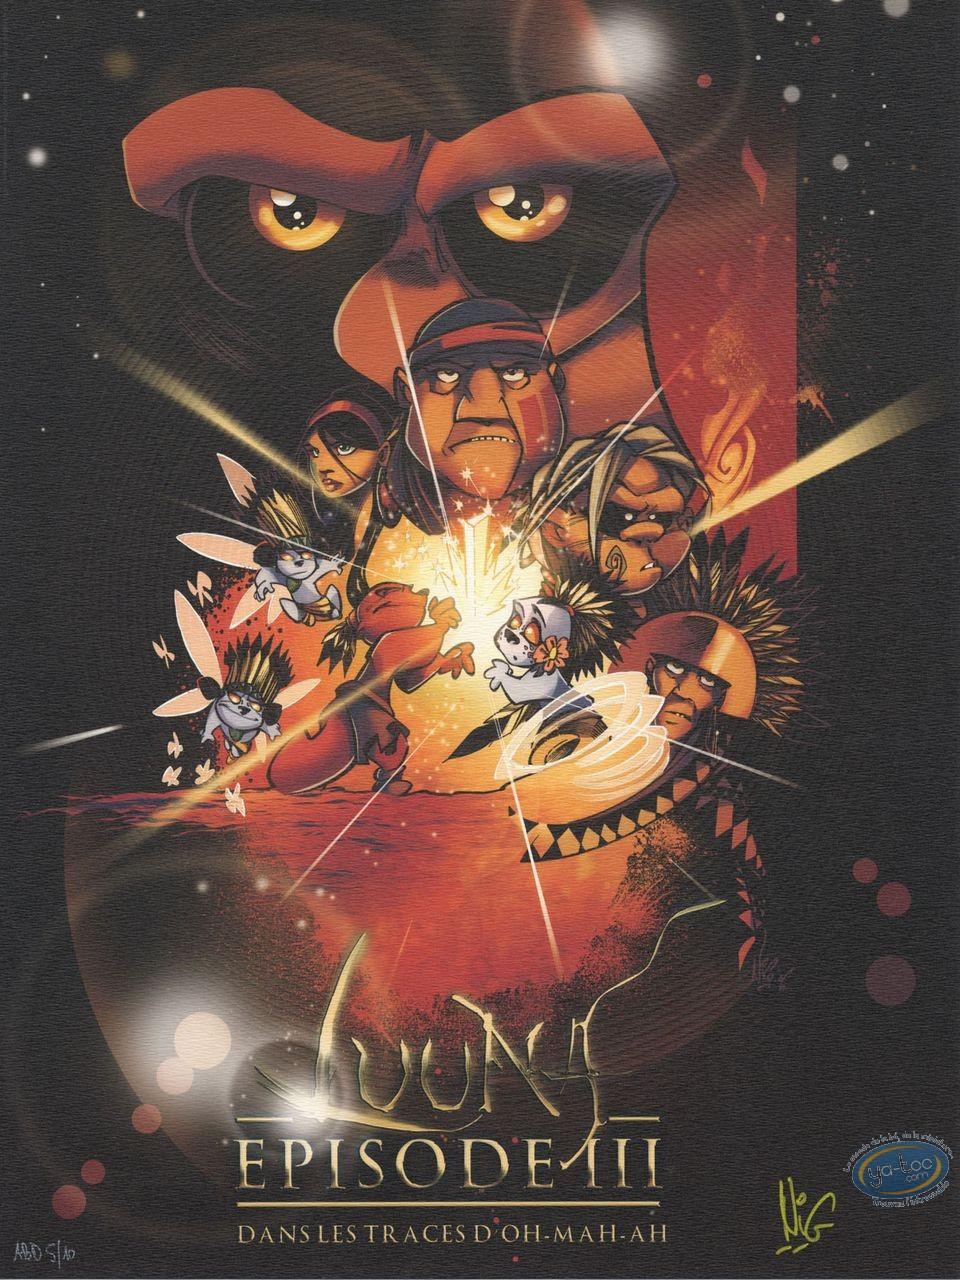 Affiche Offset, Luuna : Episode III